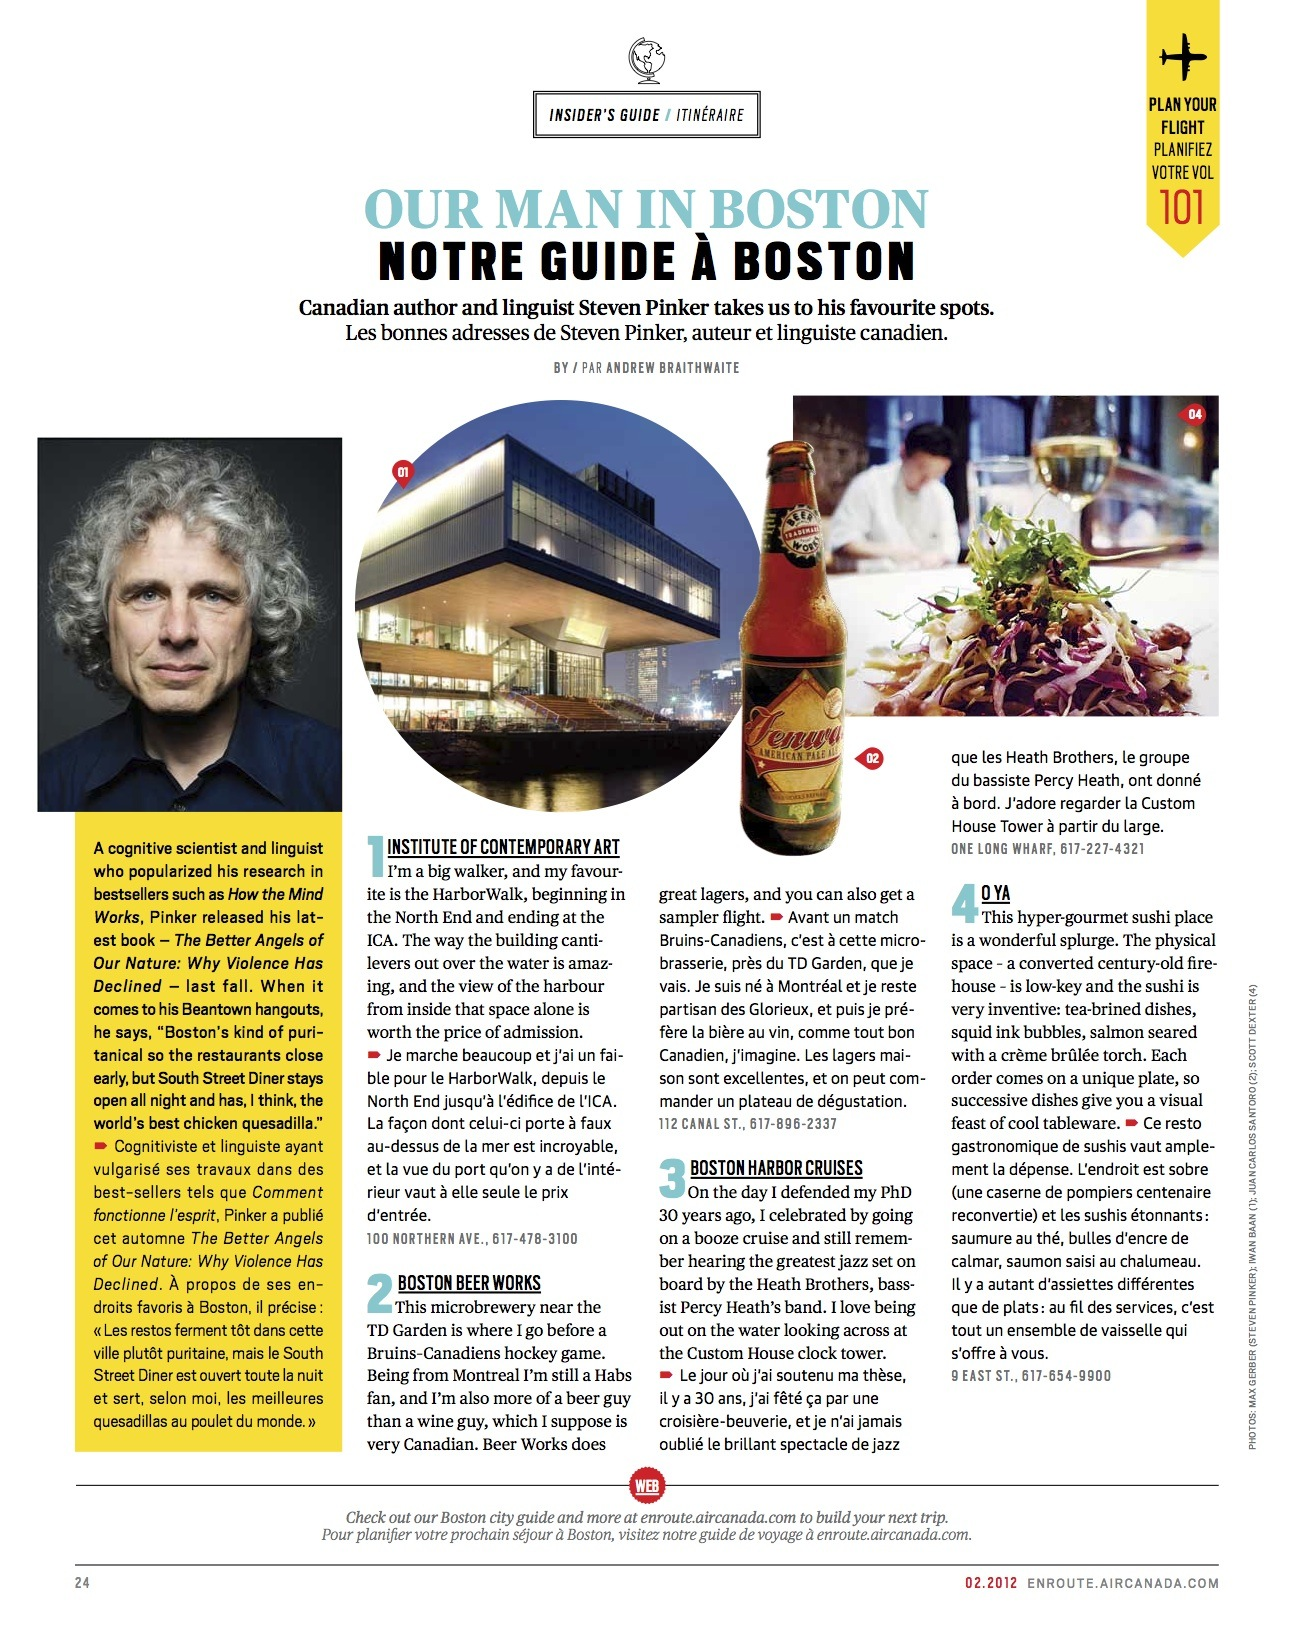 Our Man in Boston: Steven Pinker // enRoute // 2012 // web